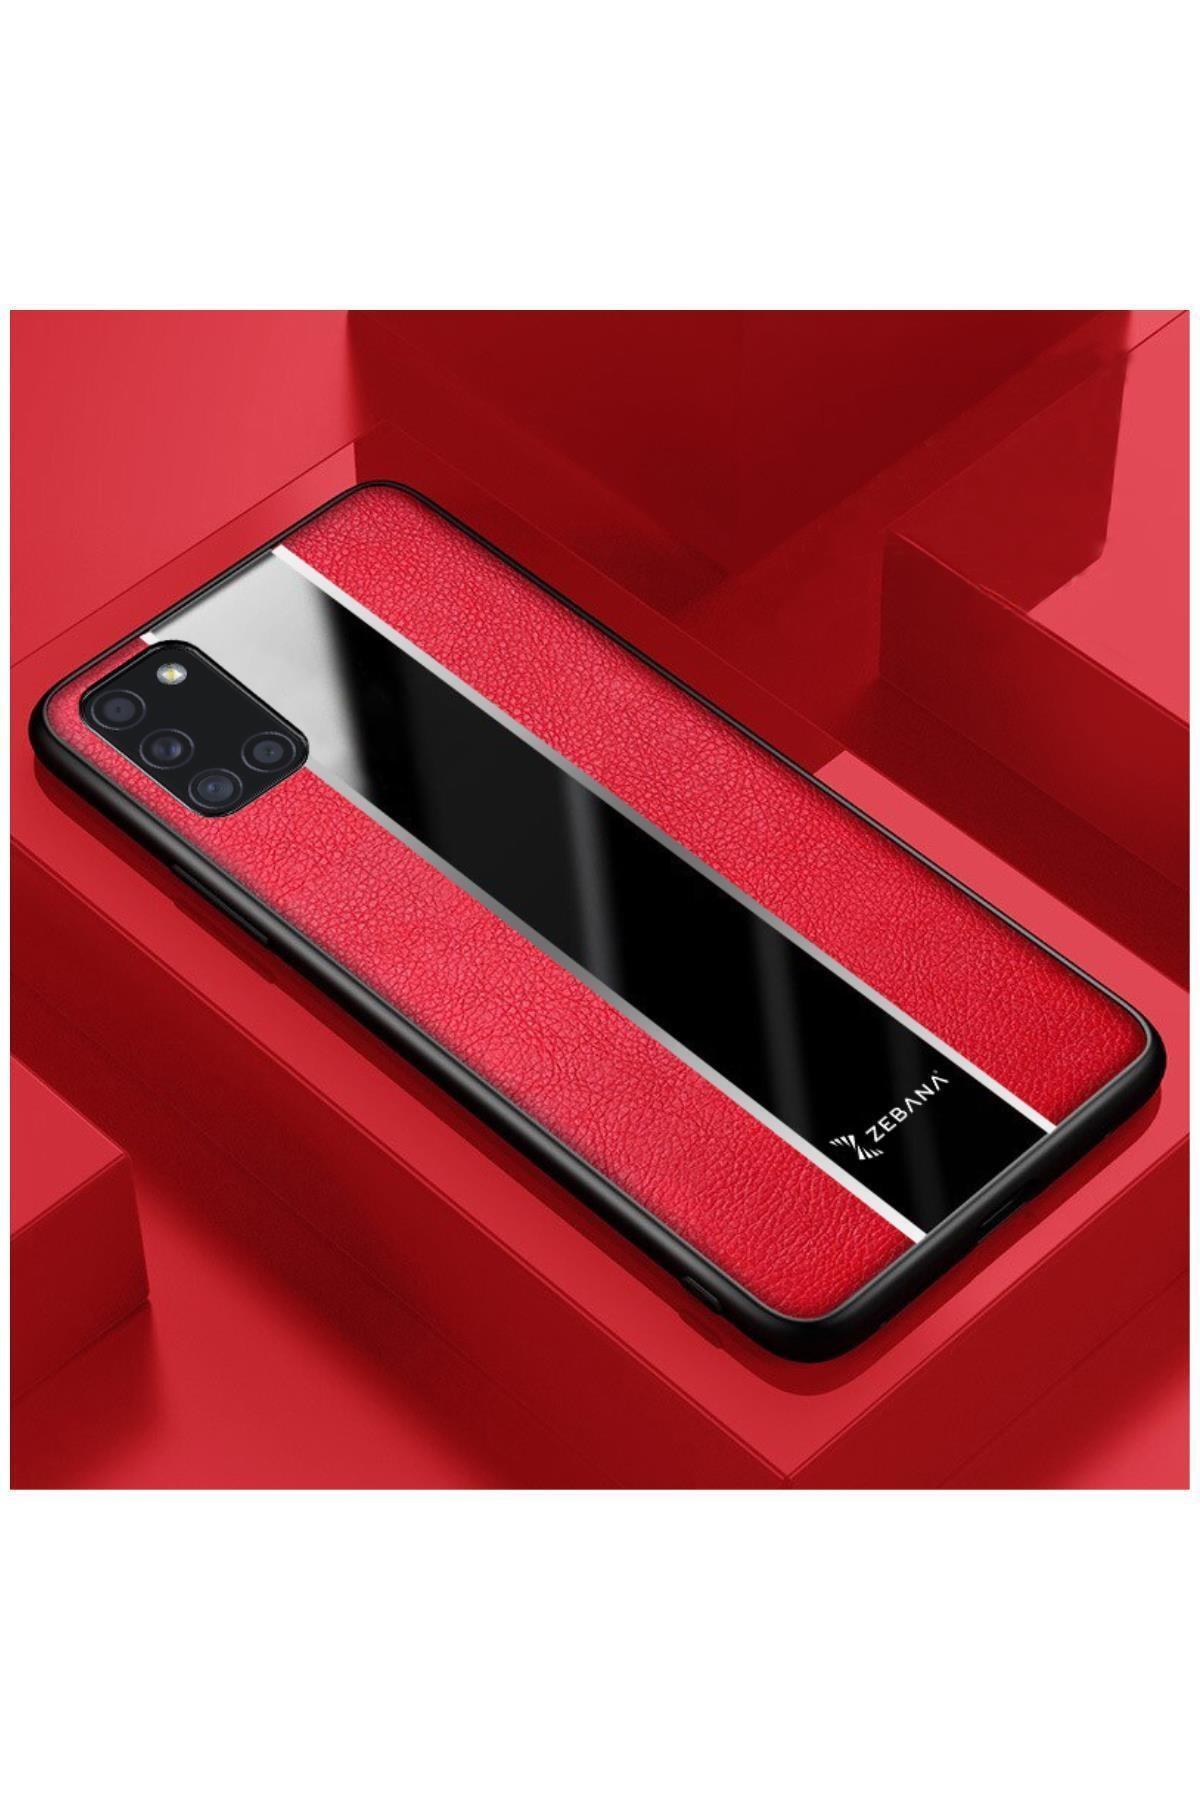 Dara Aksesuar Samsung Galaxy A31 Kılıf Zebana Premium Deri Kılıf Kırmızı 1